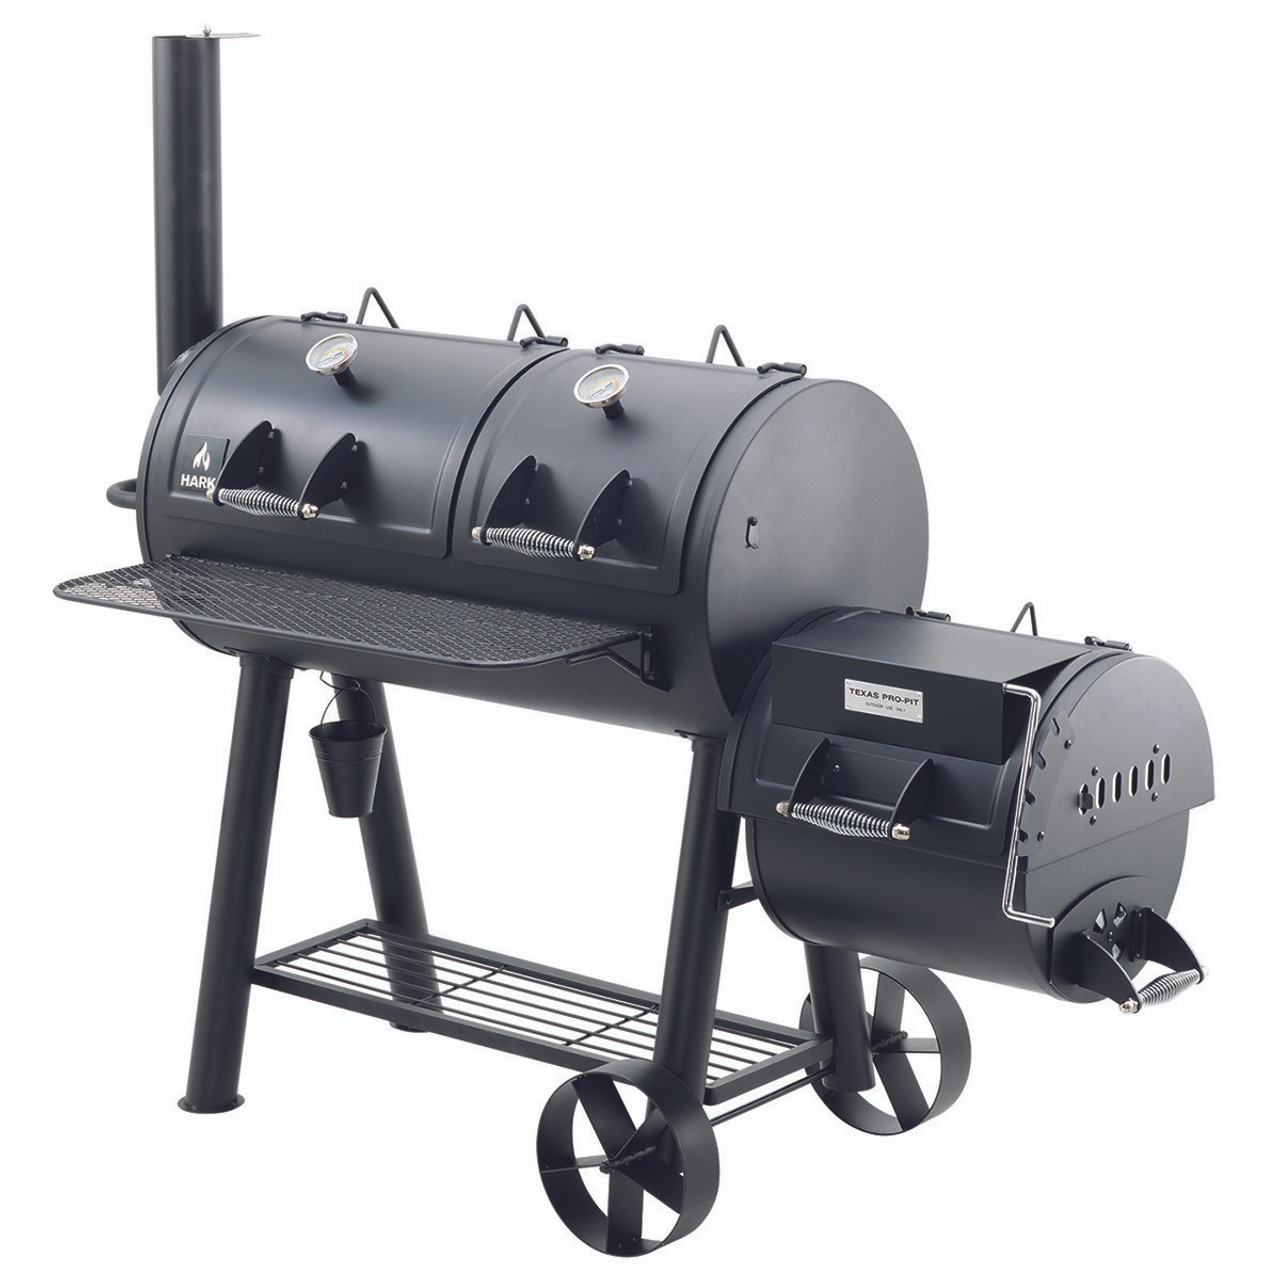 New Hark BBQ Smoking Accessory Set